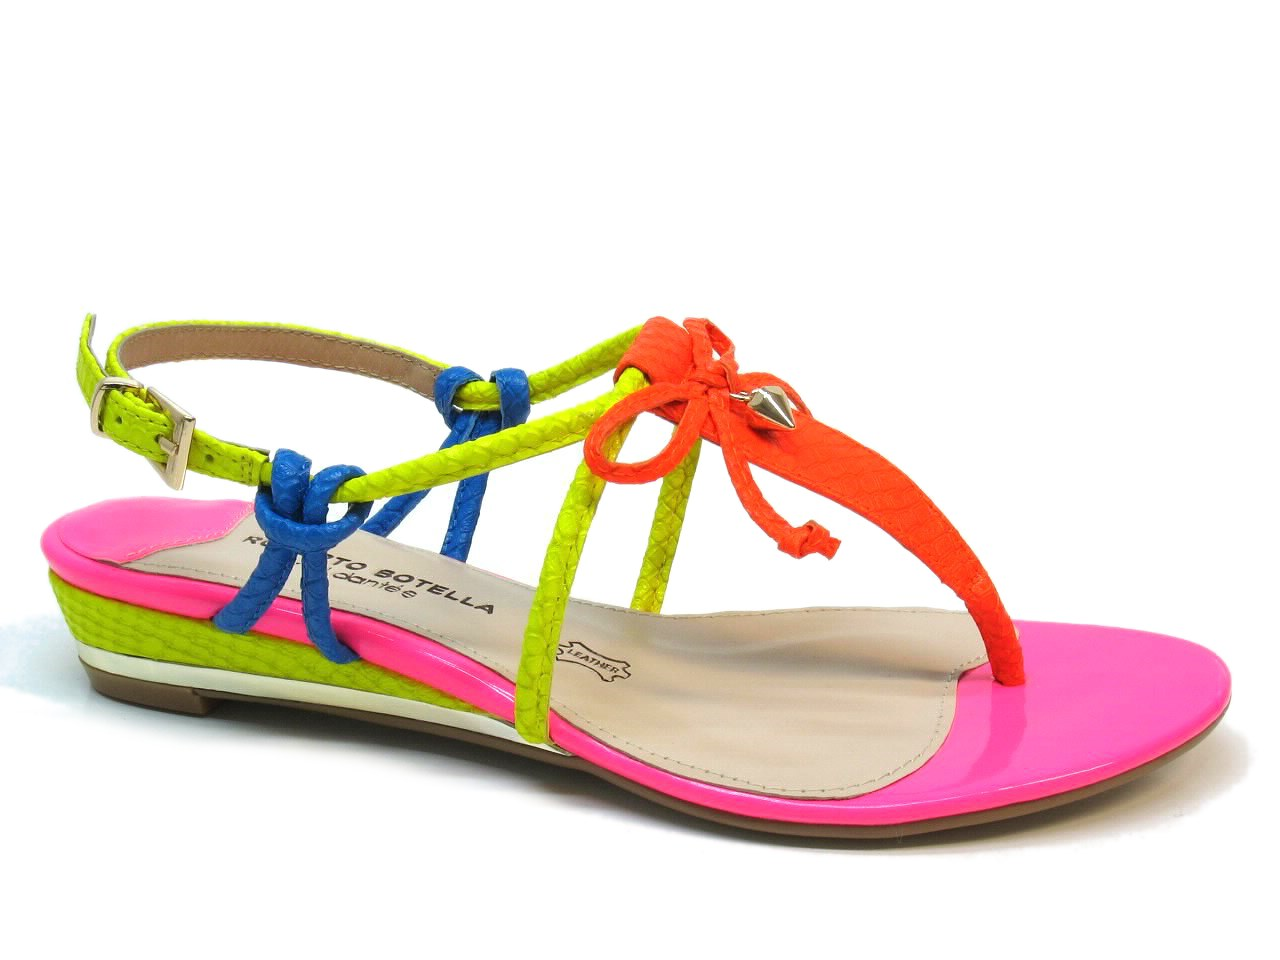 Wedge Sandals Roberto Botella - 387 M13125